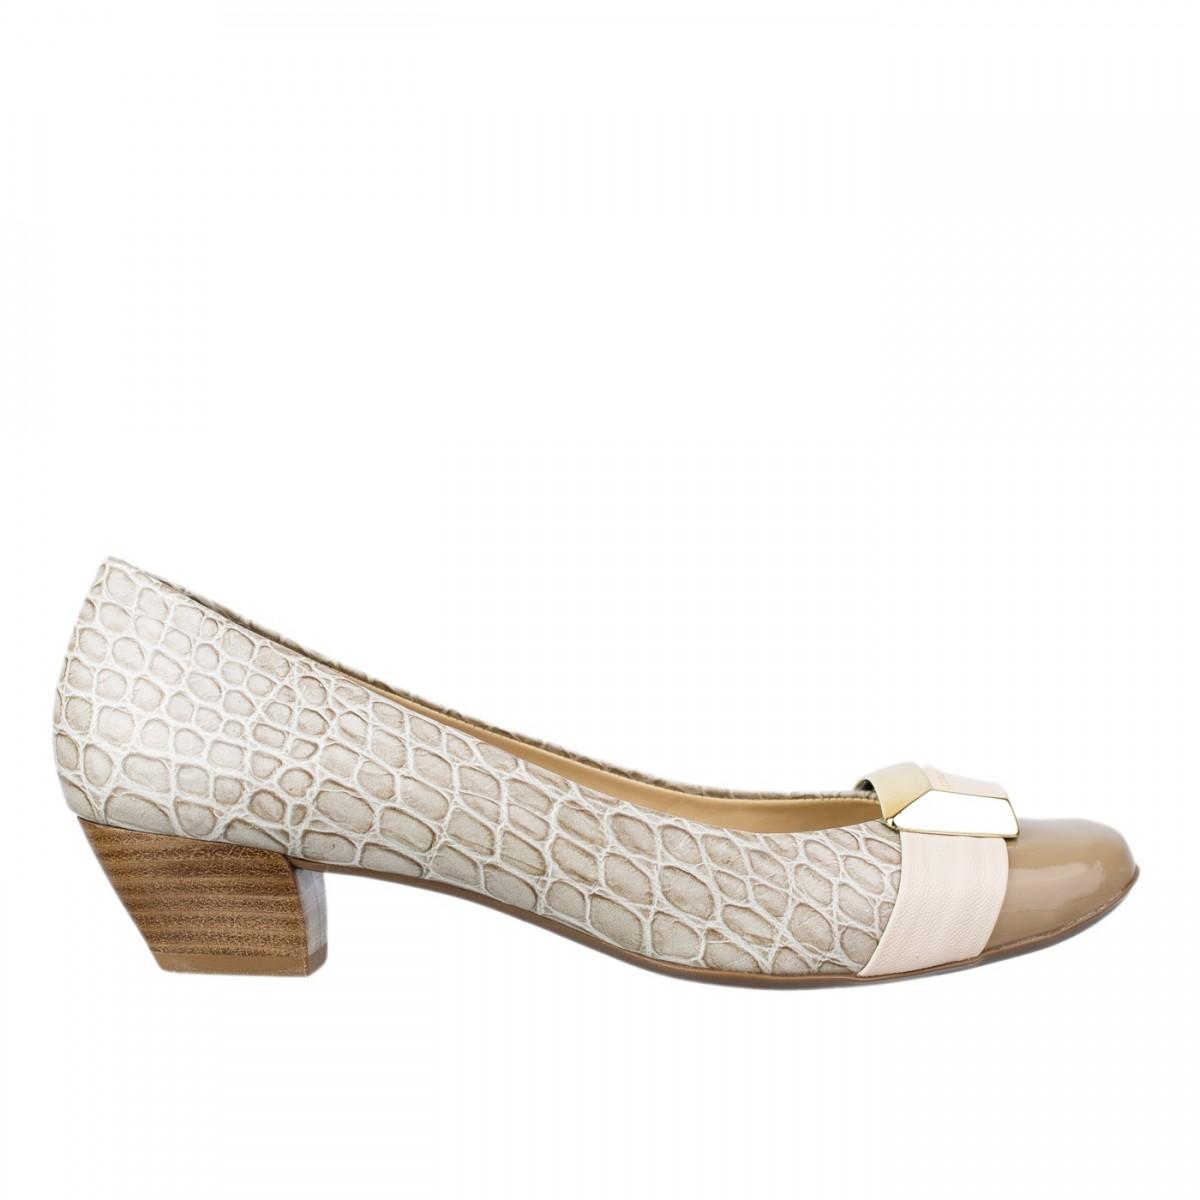 67b2ebc99 Bizz Store - Sapato Feminino Jorge Bischoff Salto Baixo Couro